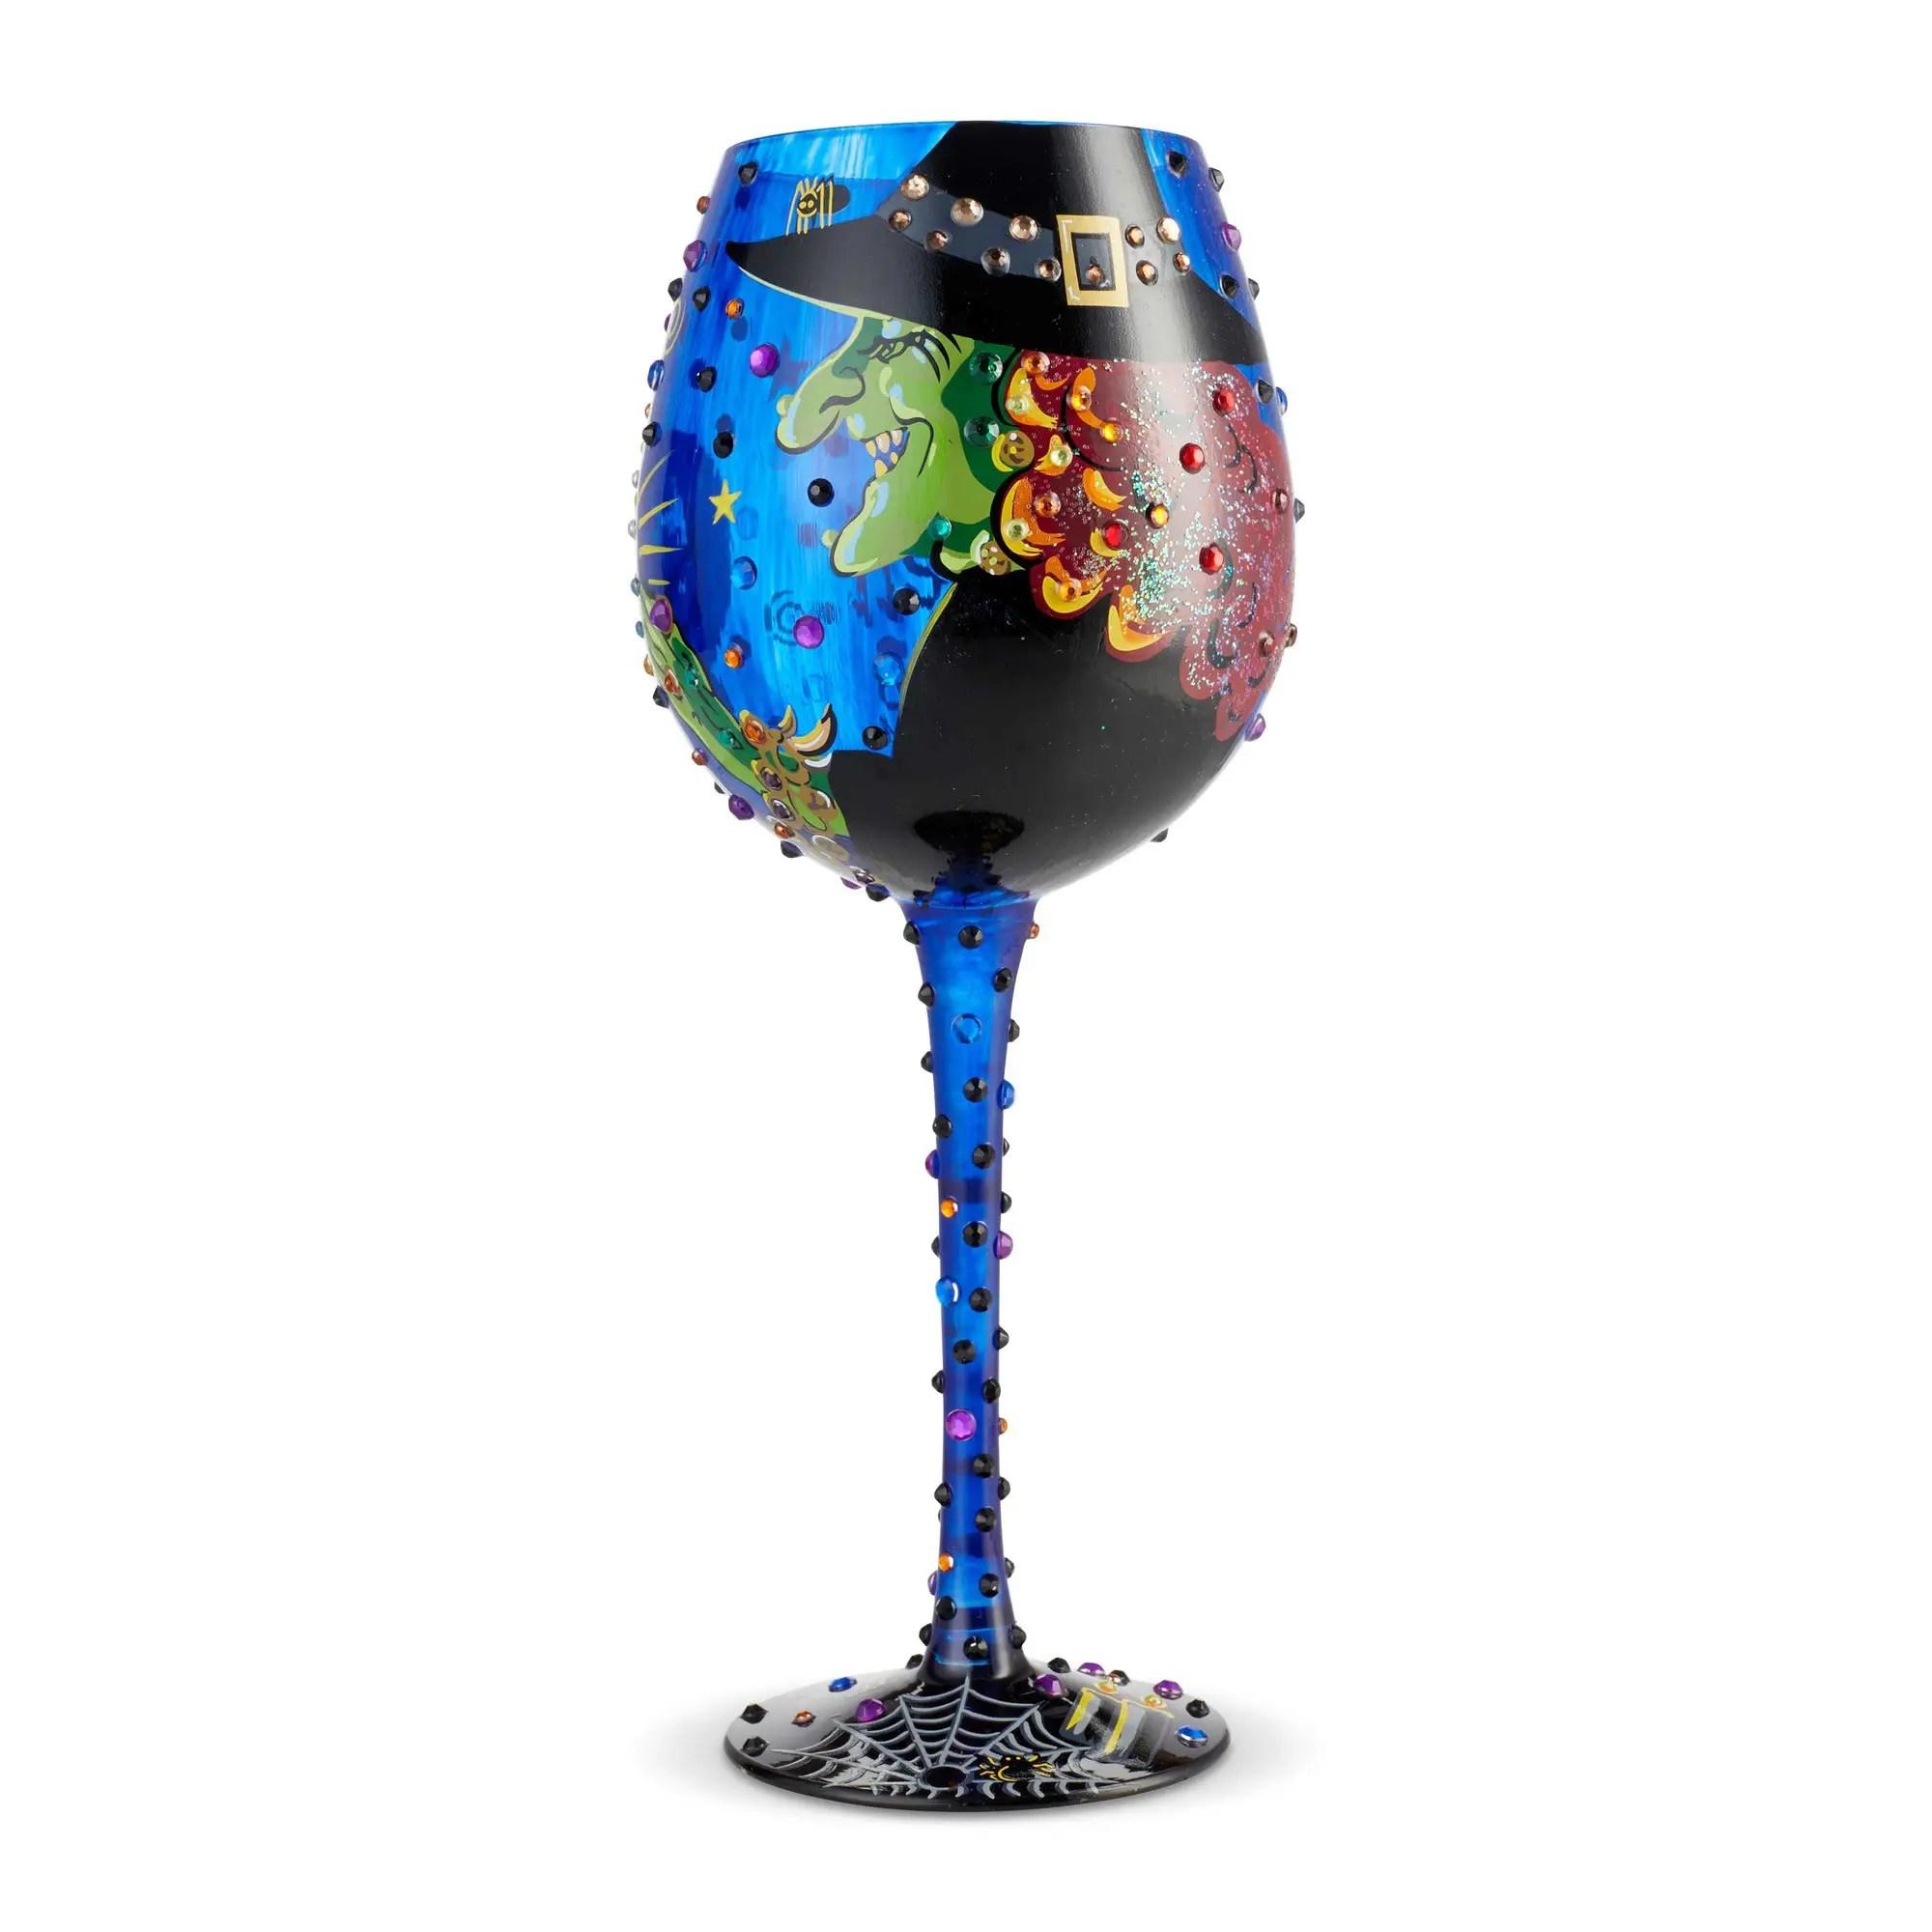 fd9b98fa7e1 Bling Cast a Spell 22oz. Wine Glass by Lolita 6004428